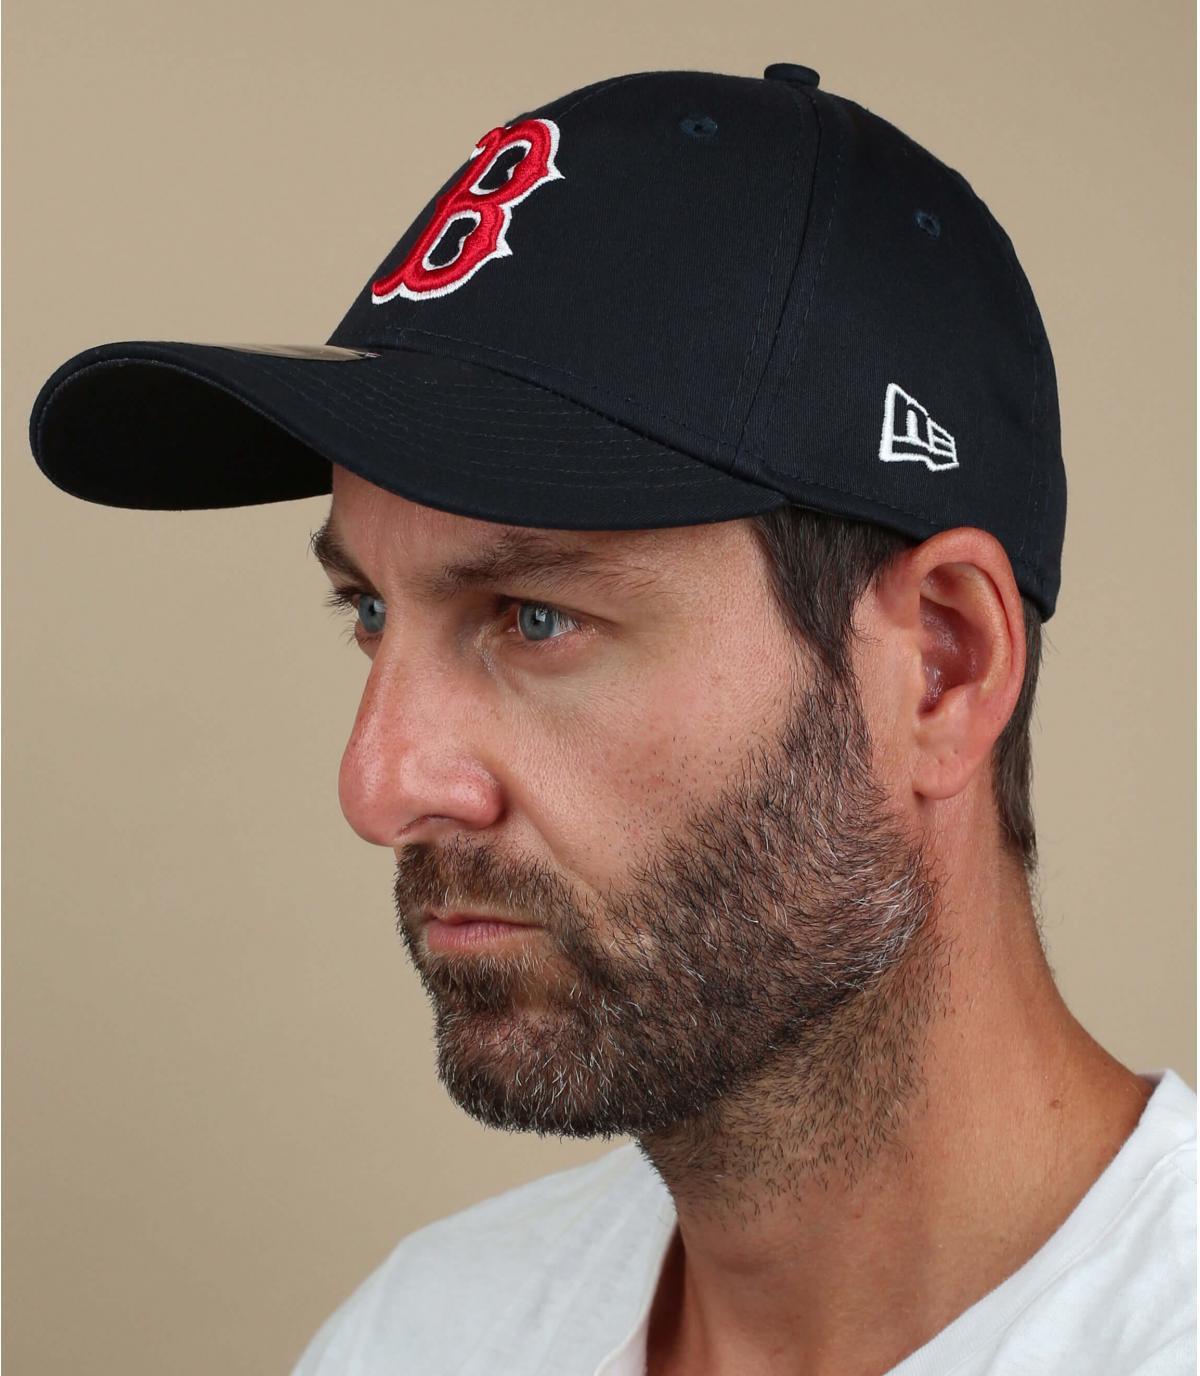 navy blue B stretch cap